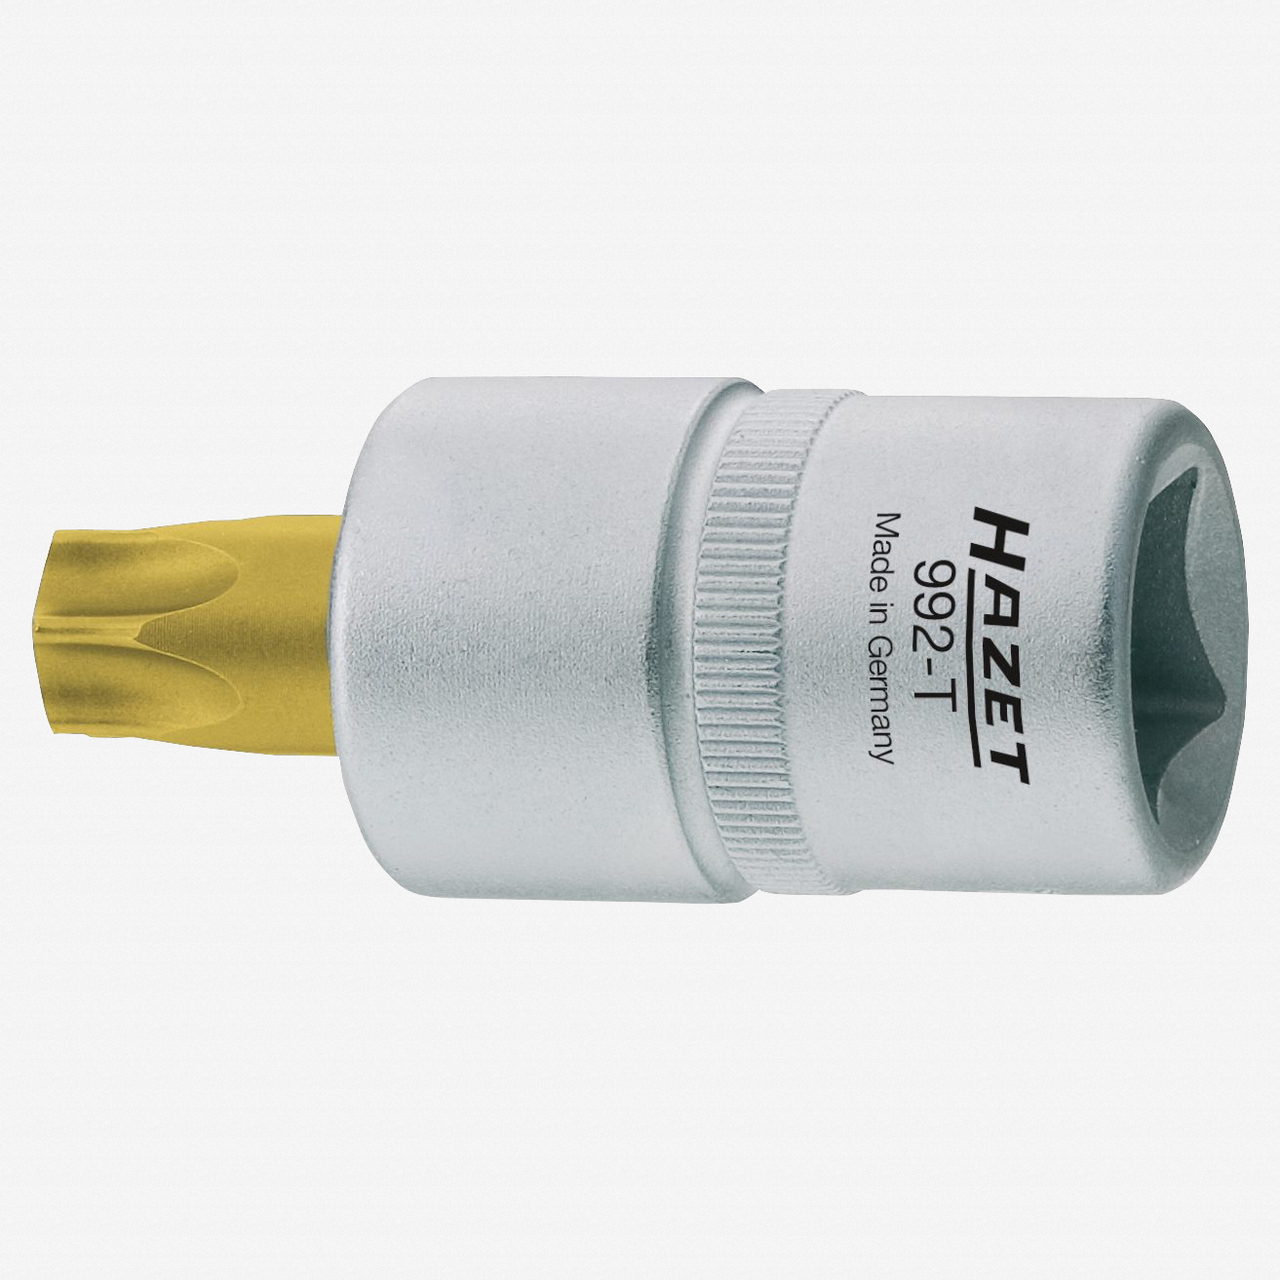 "Hazet 992-T60 T60 Torx TiN Socket 1/2"" - KC Tool"